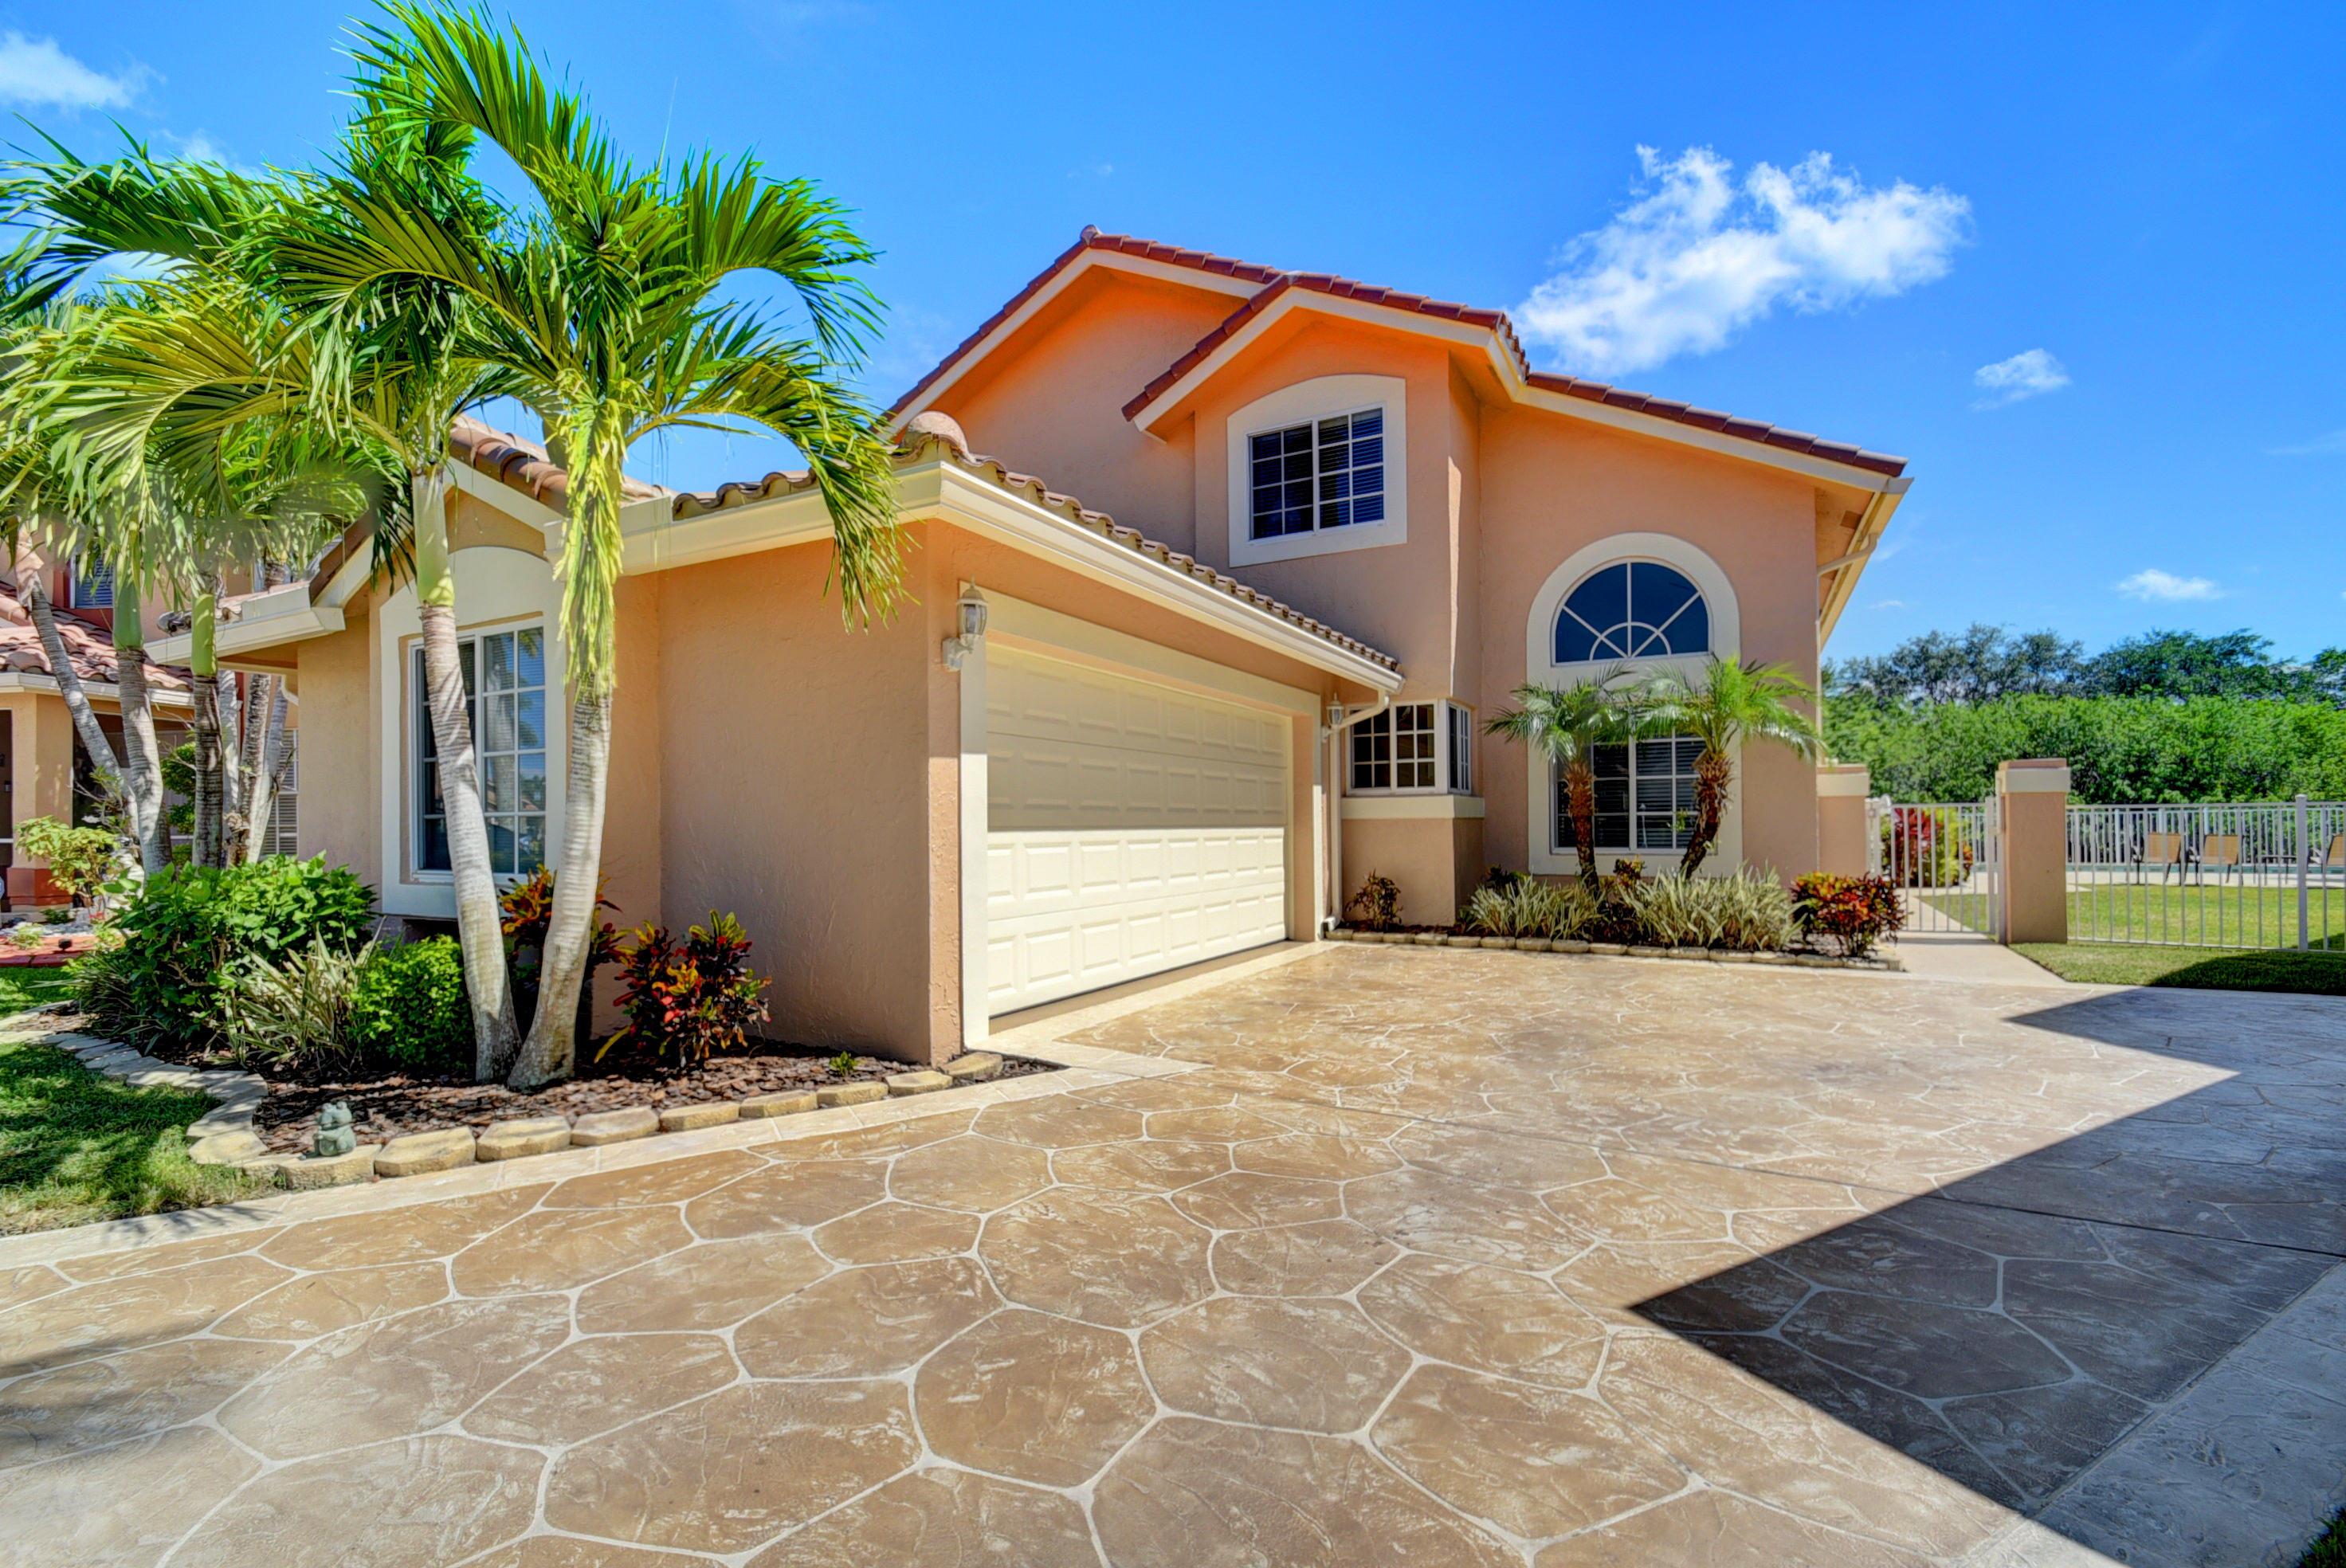 11244 Jasmine Hill Circle Boca Raton, FL 33498